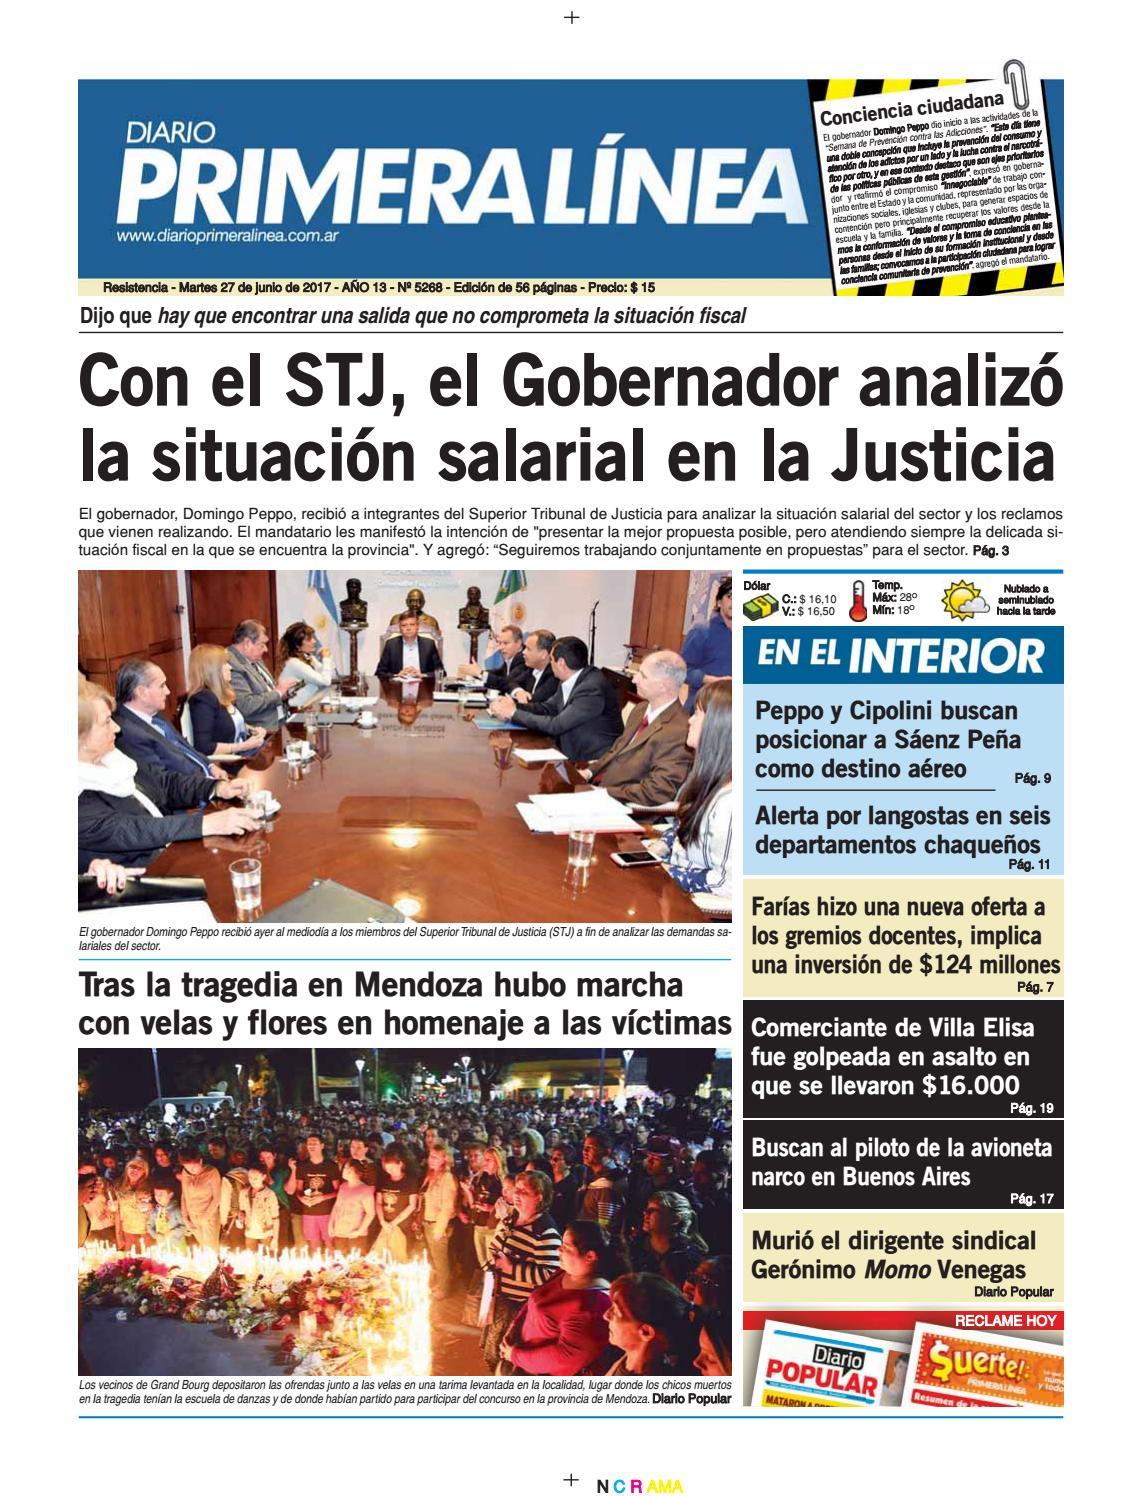 Primera Línea 5268 27 06 17 by Diario Primera Linea - issuu